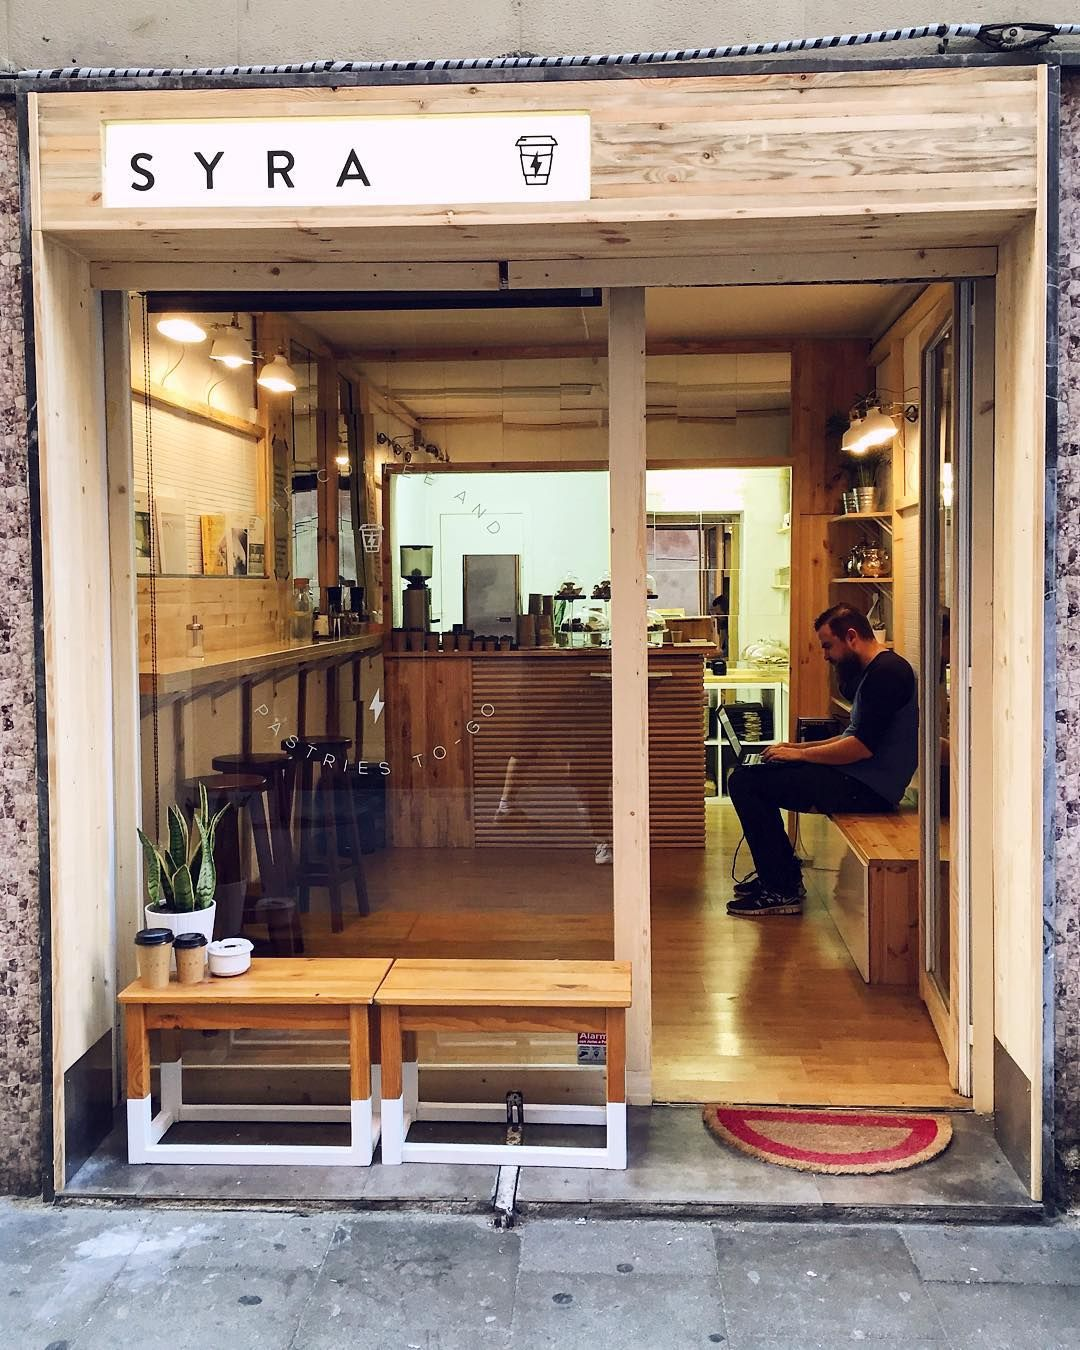 Syra coffee gracia barcelona pastry shop interior design also amor in pinterest rh